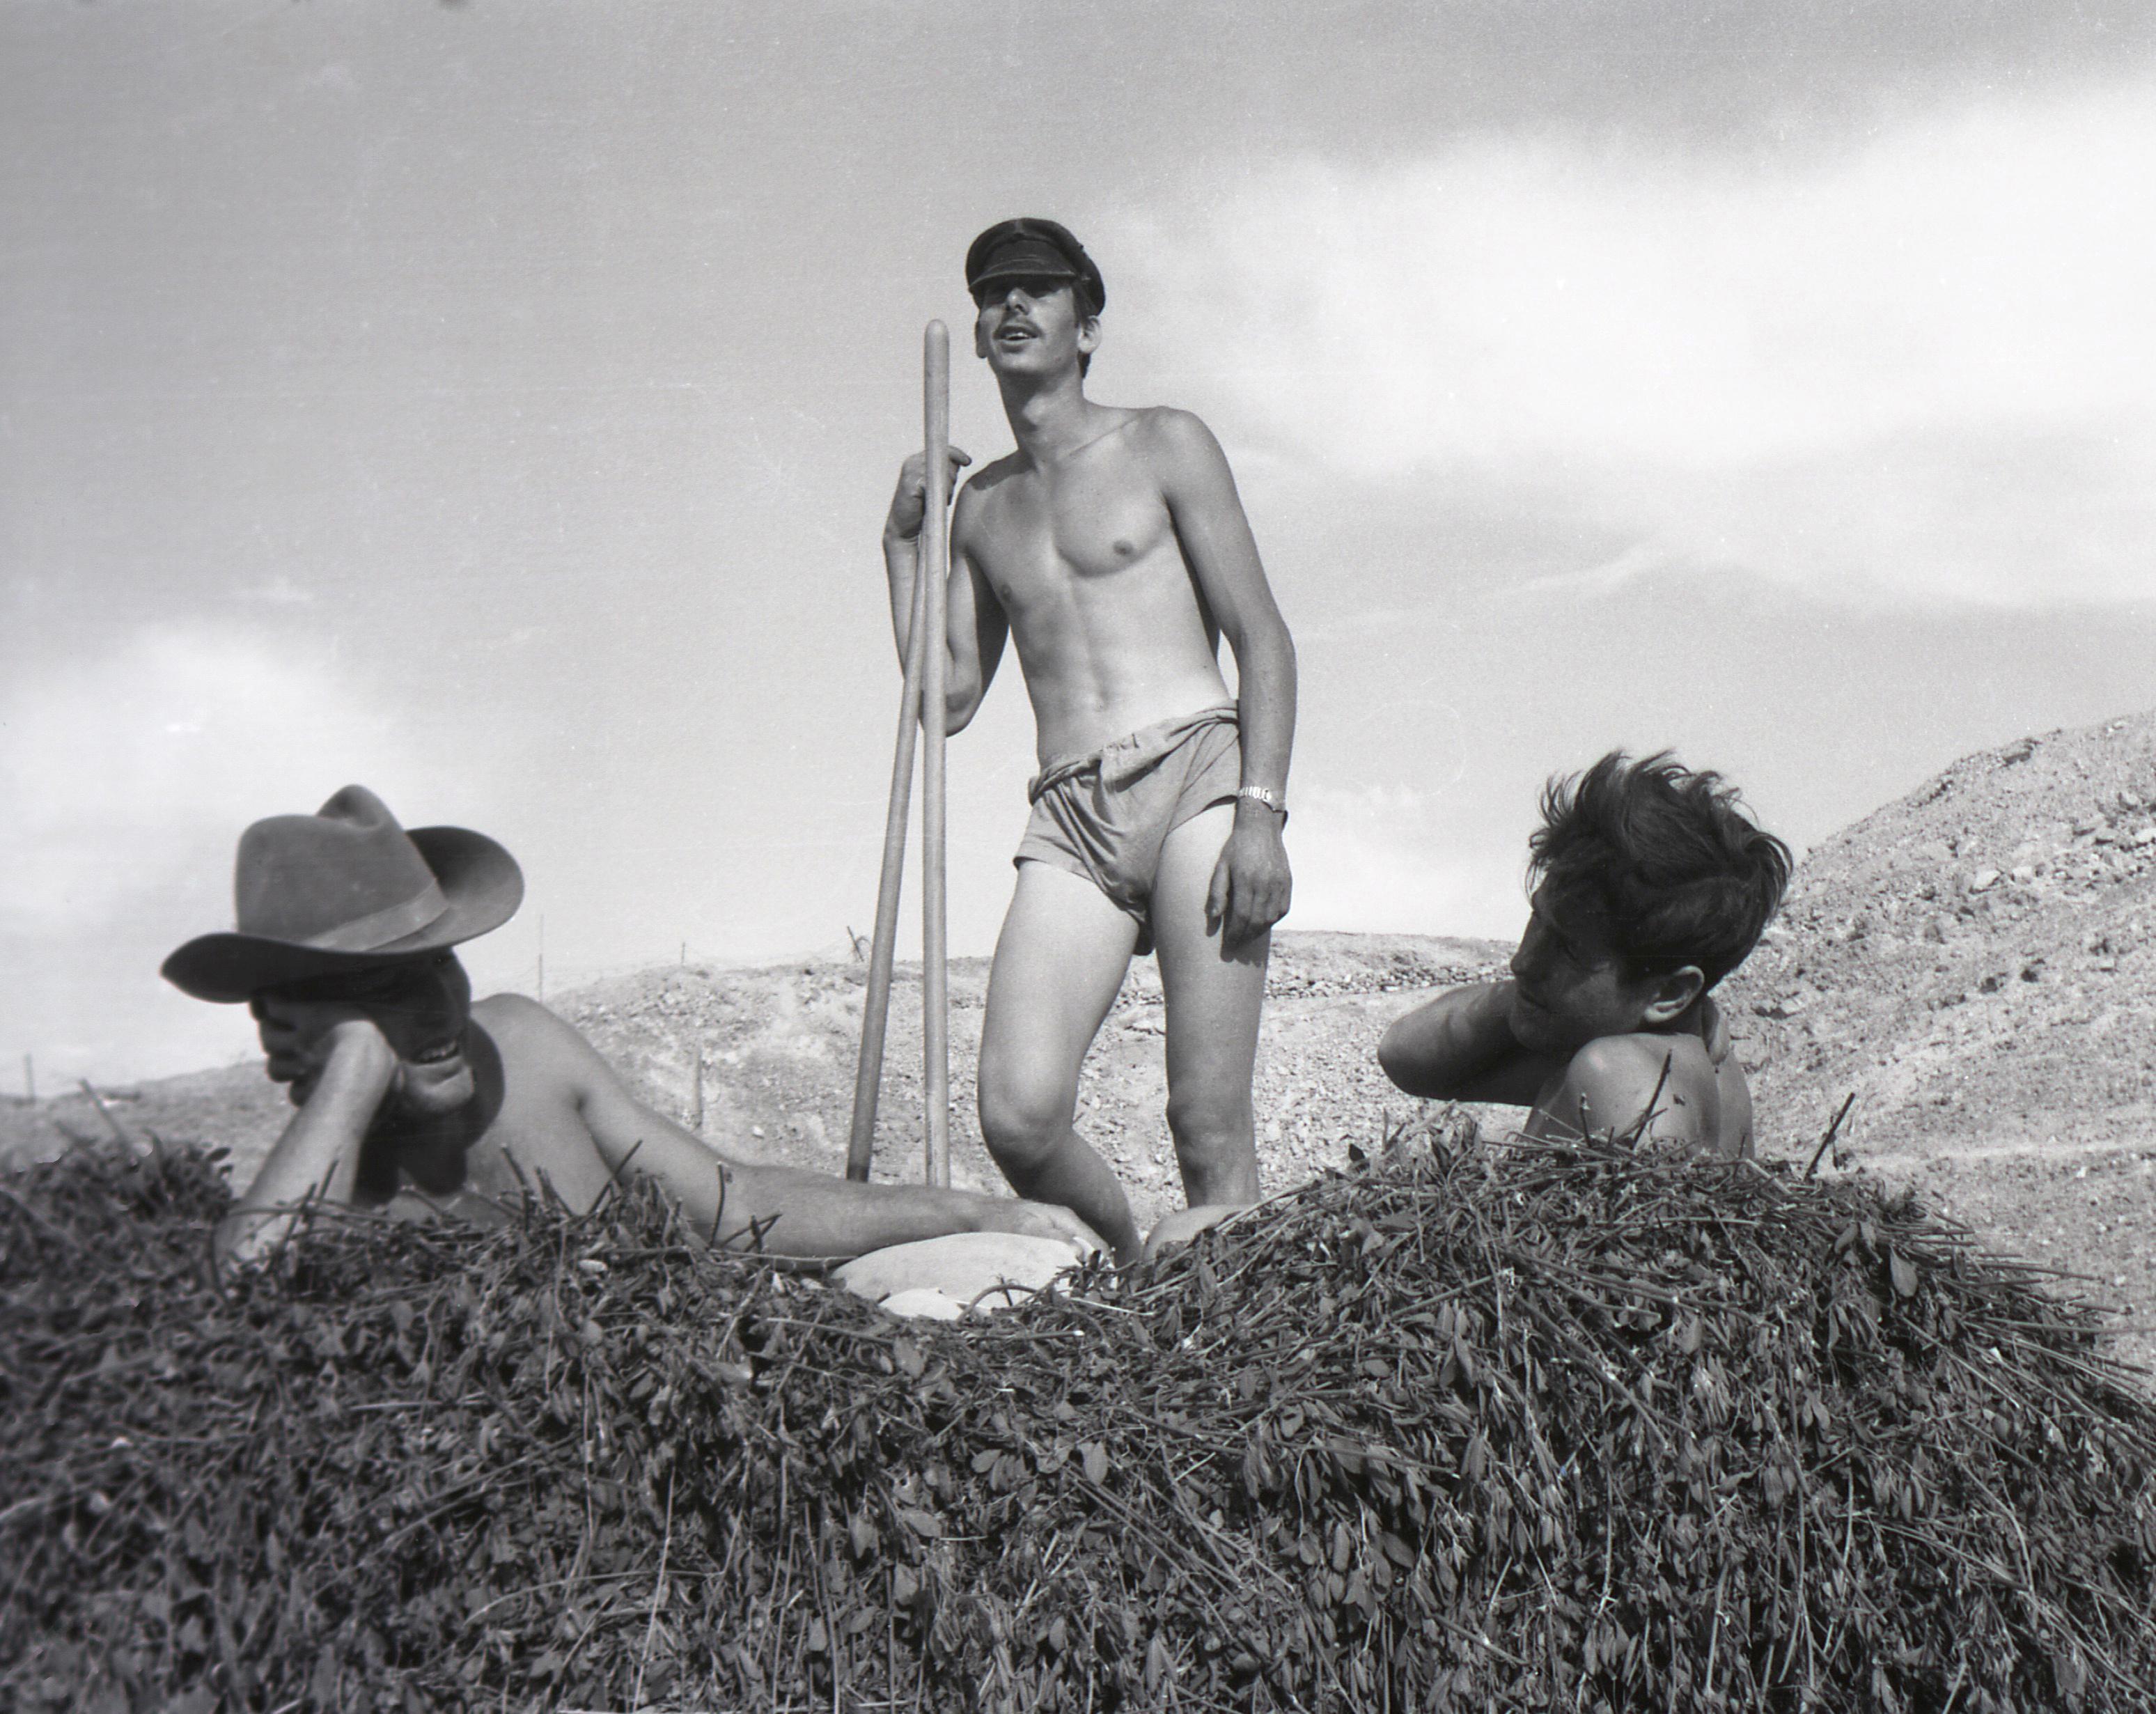 Observer archive: on a kibbutz, 26 May 1958